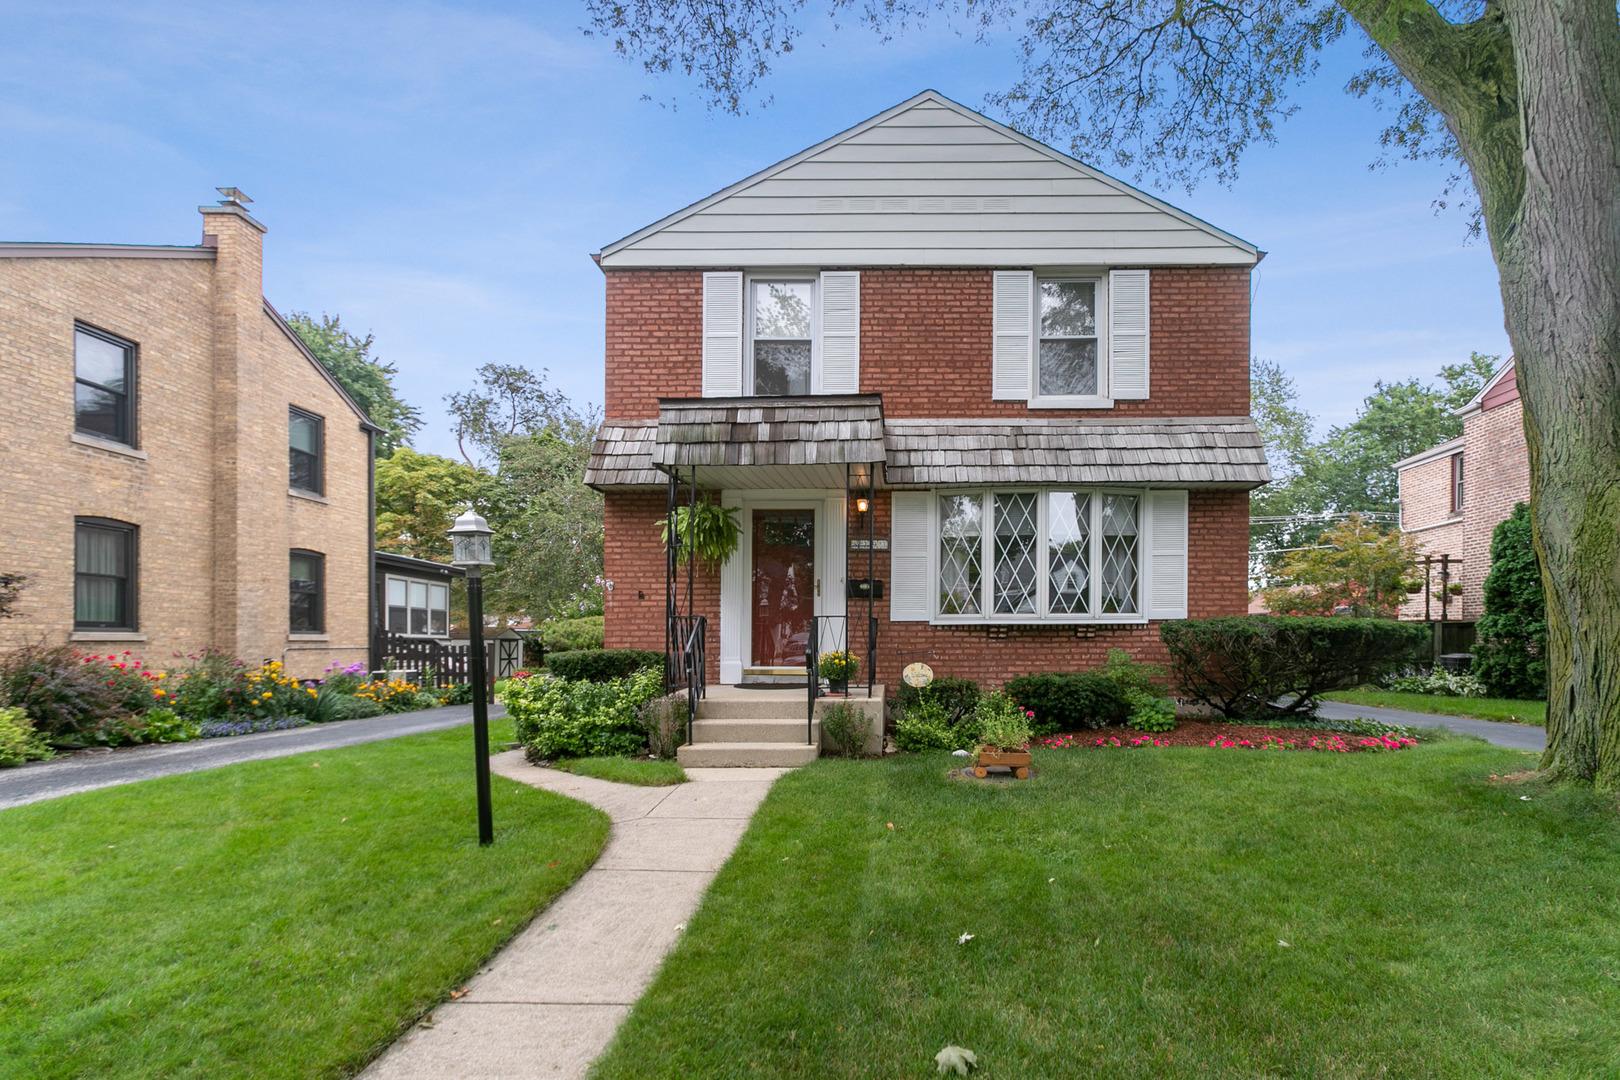 8293 North Merrill Street, Niles, Illinois